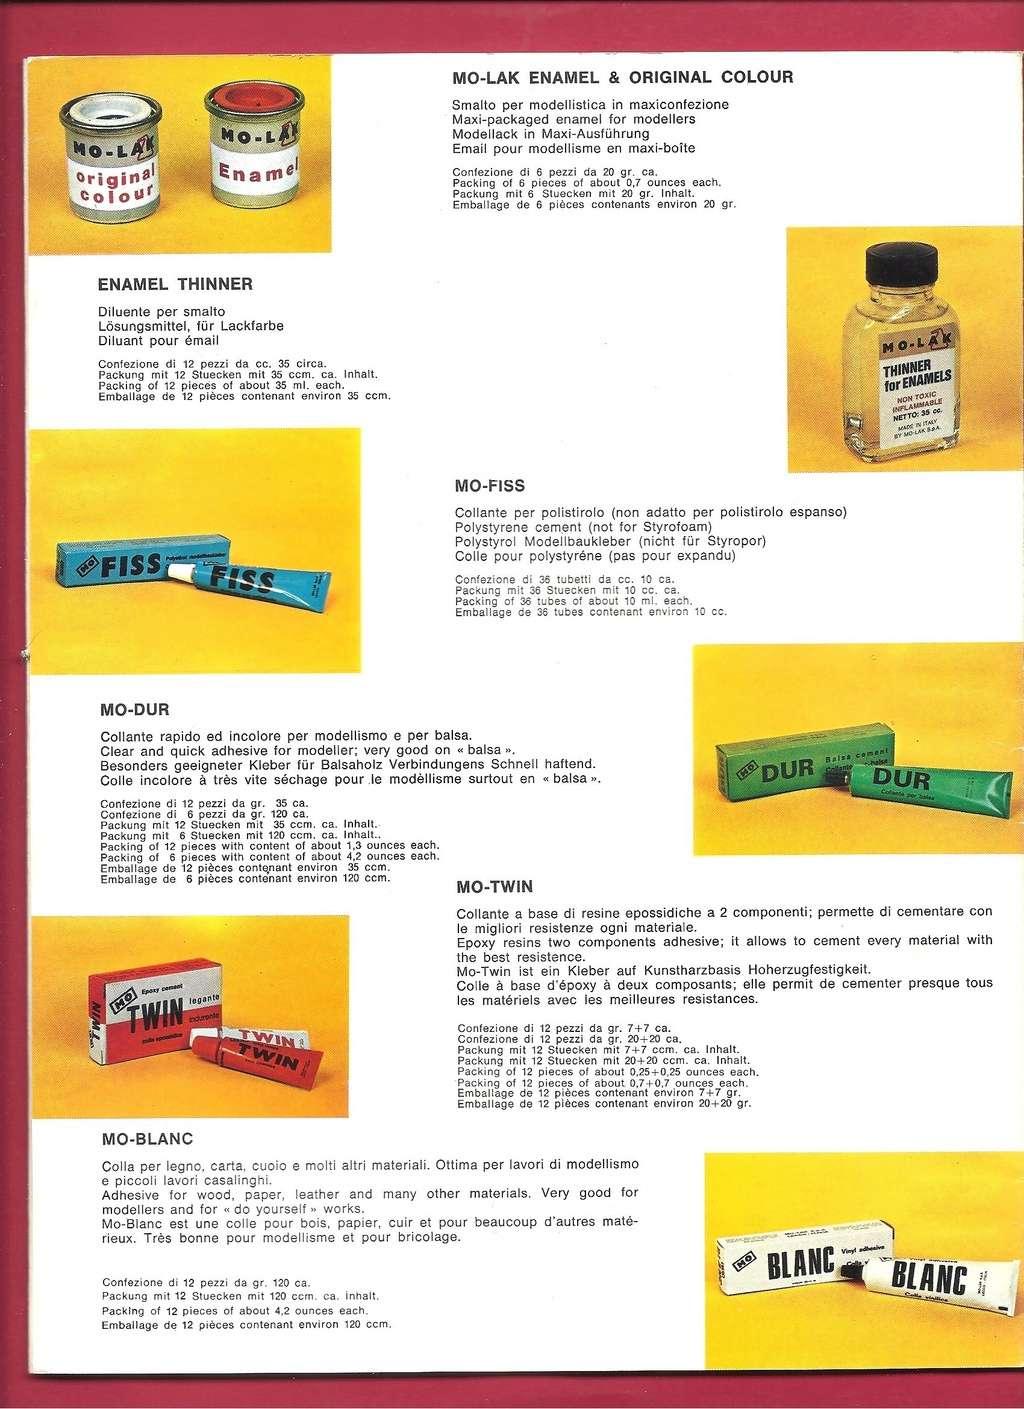 [MOLAK 197.] Catalogue 197. Molak_15